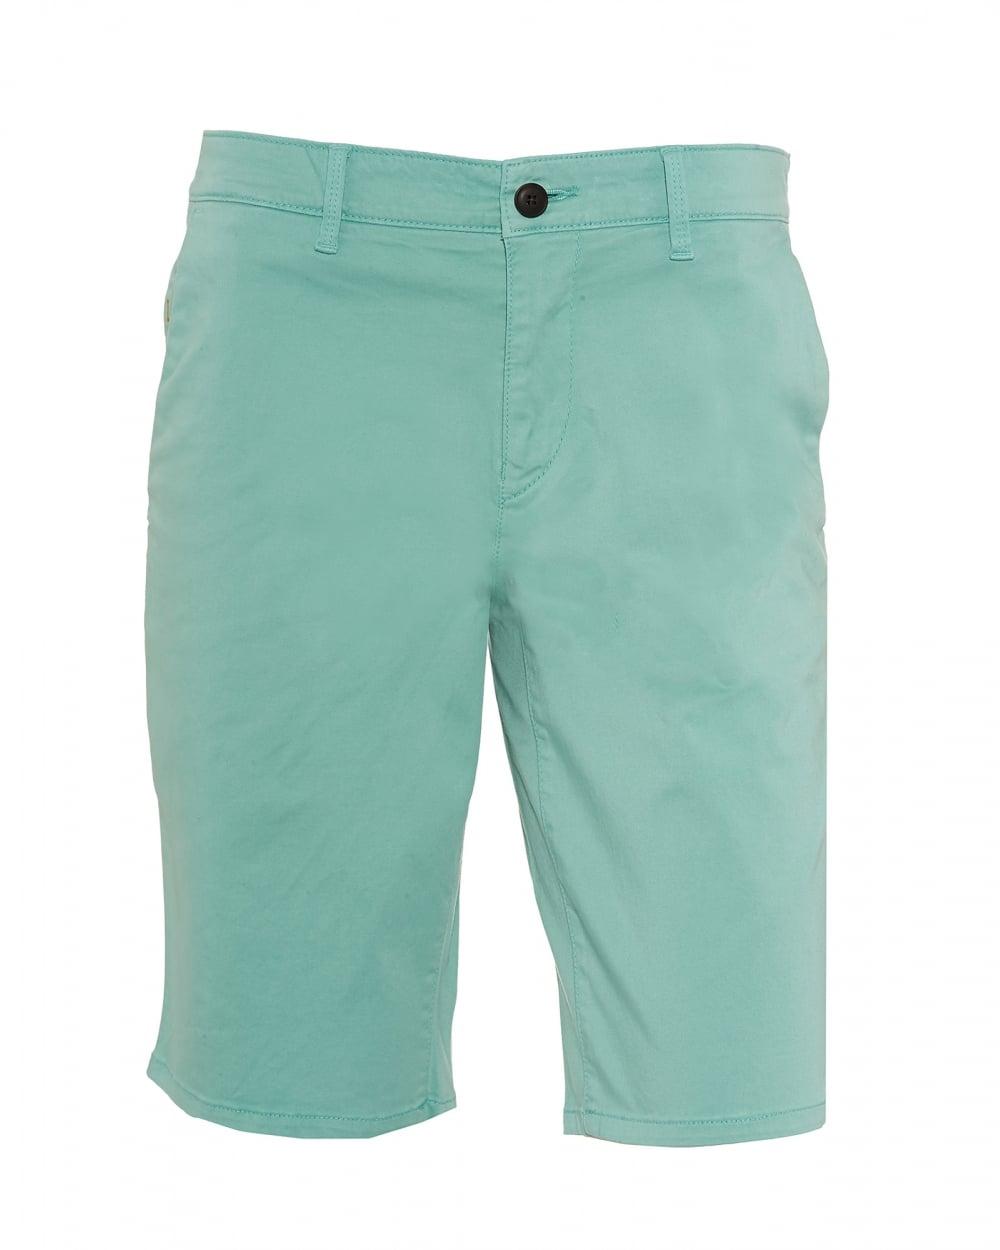 Mens Schino-Slim-Shorts-D Slim Fit Chino Mint Green Shorts